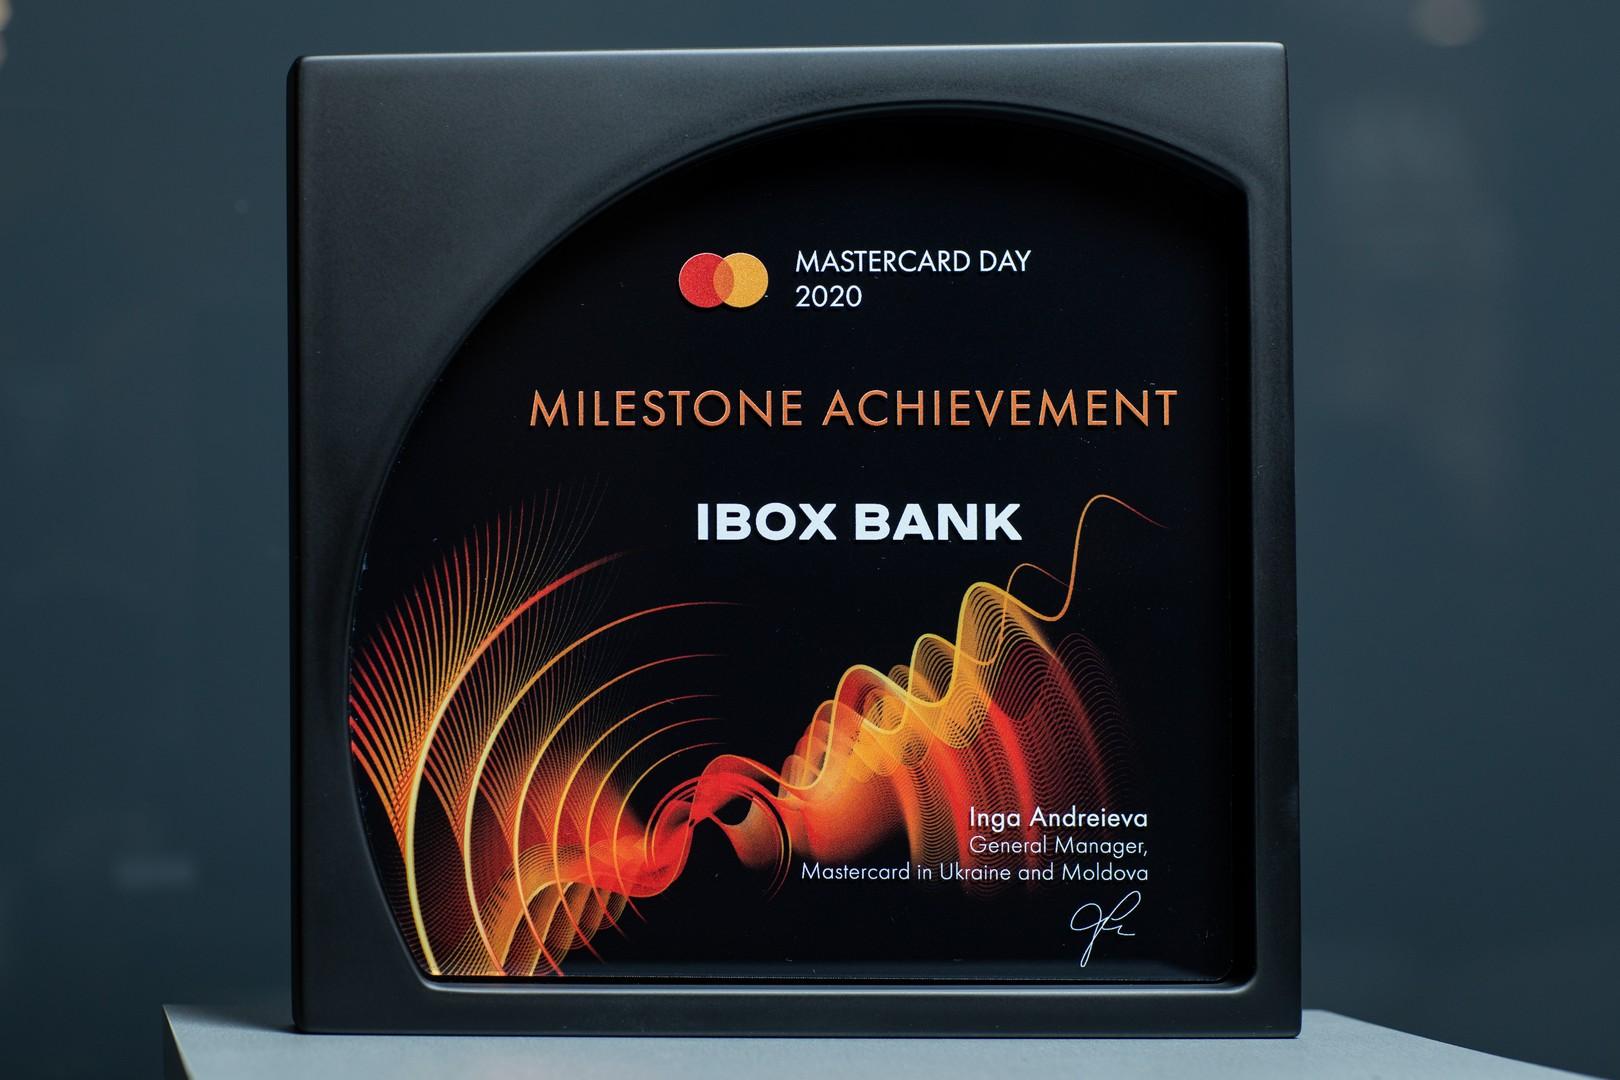 IBOX Bank отримав нагороду Milestone Achievement на Mastercard Day 2020 за отримання статусу принципального члена Mastercard